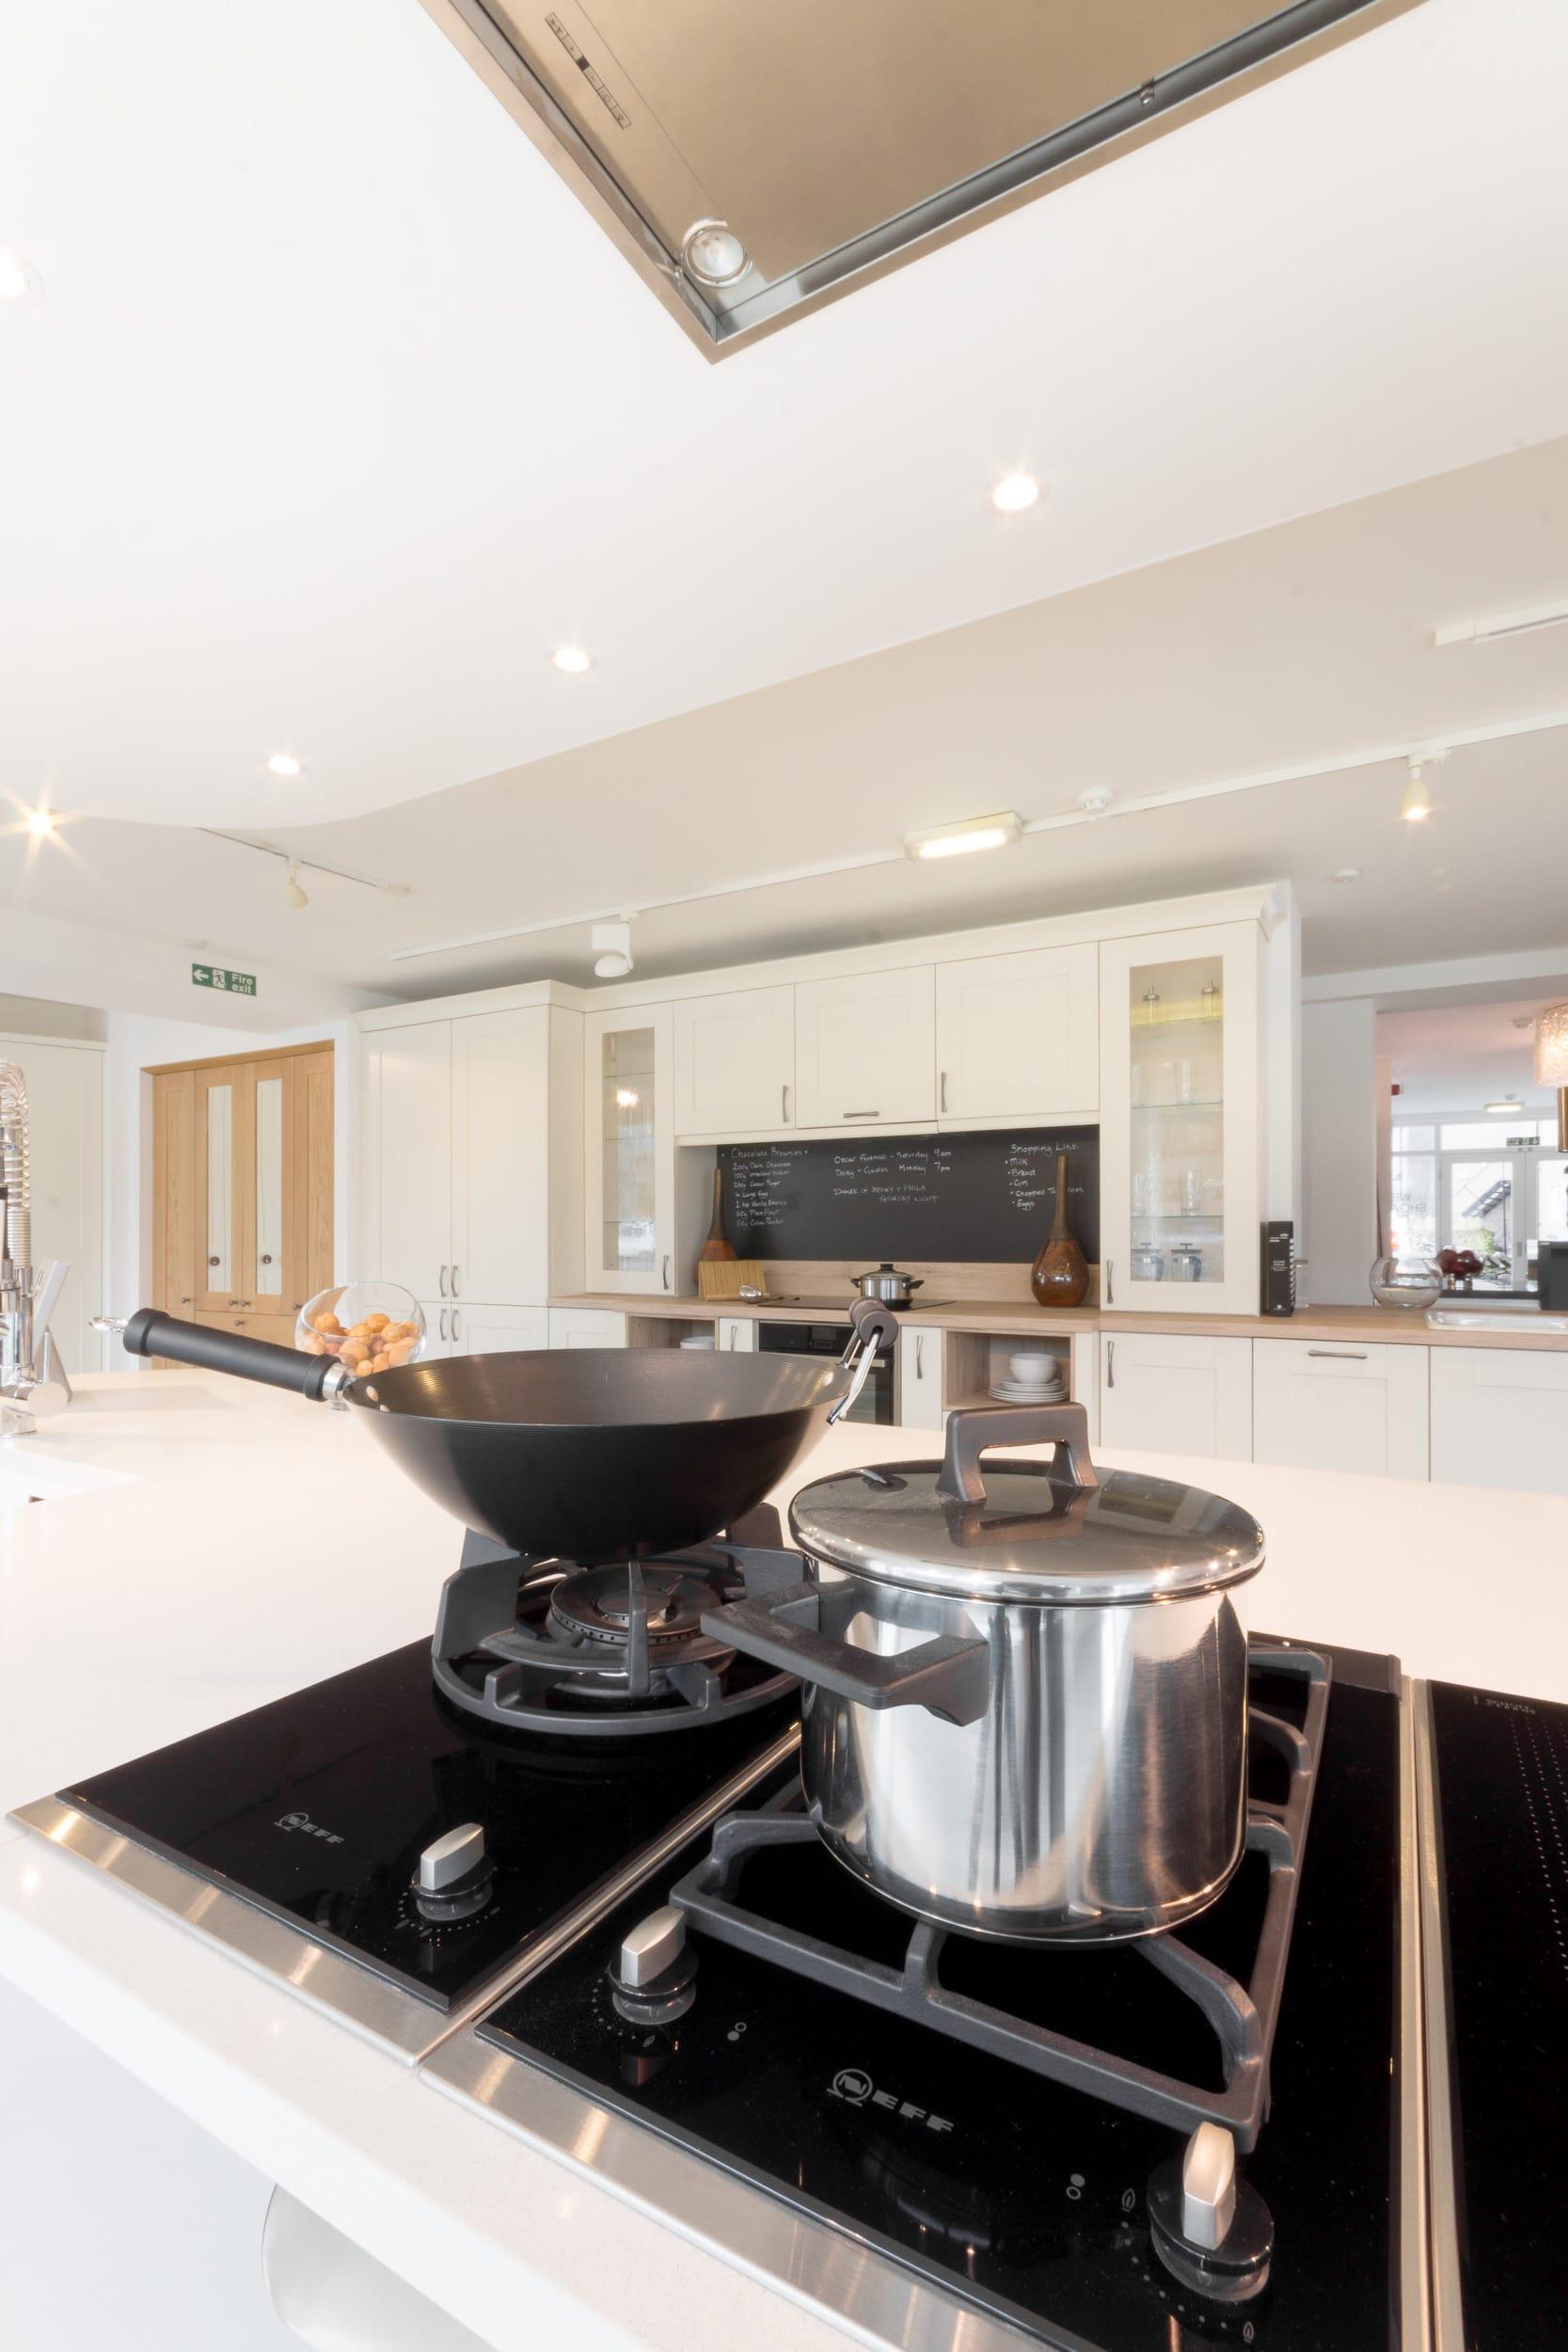 Kitchen-Showroom-Webbs-Kendal-30.jpg